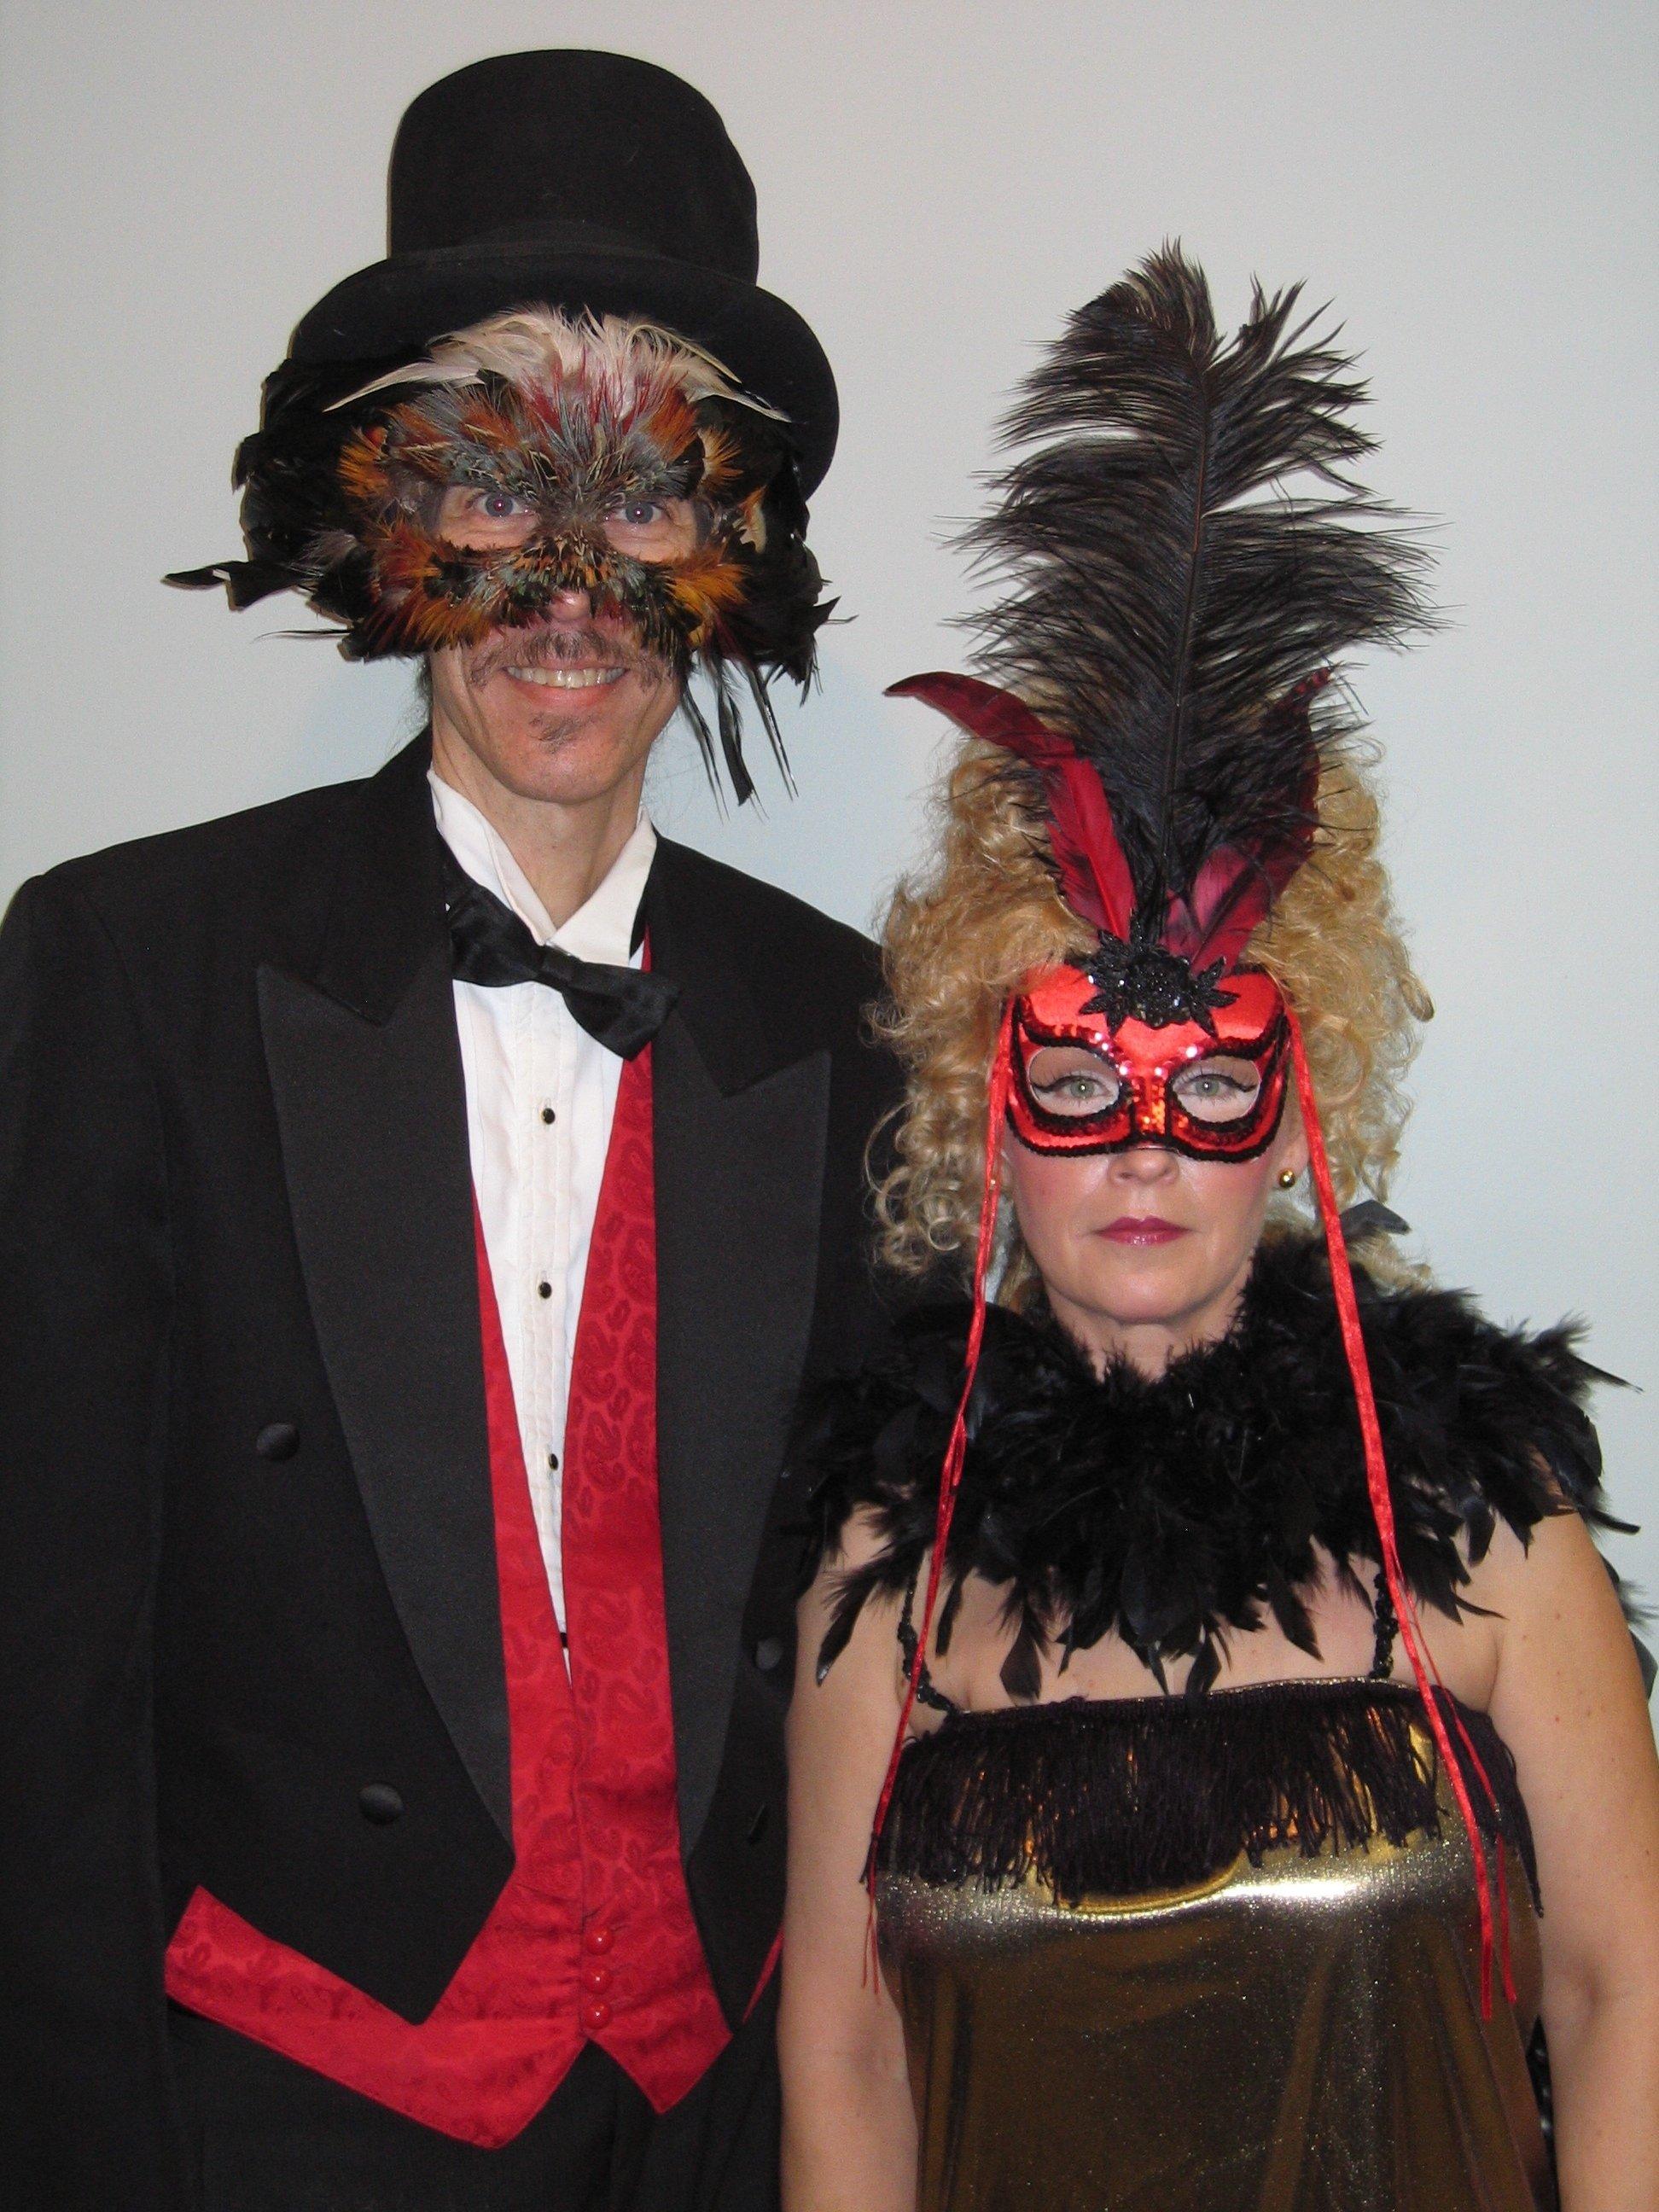 10 Fabulous Mardi Gras Costume Ideas For Couples mardi gras mystery couple halloween costume couples fashion 2021